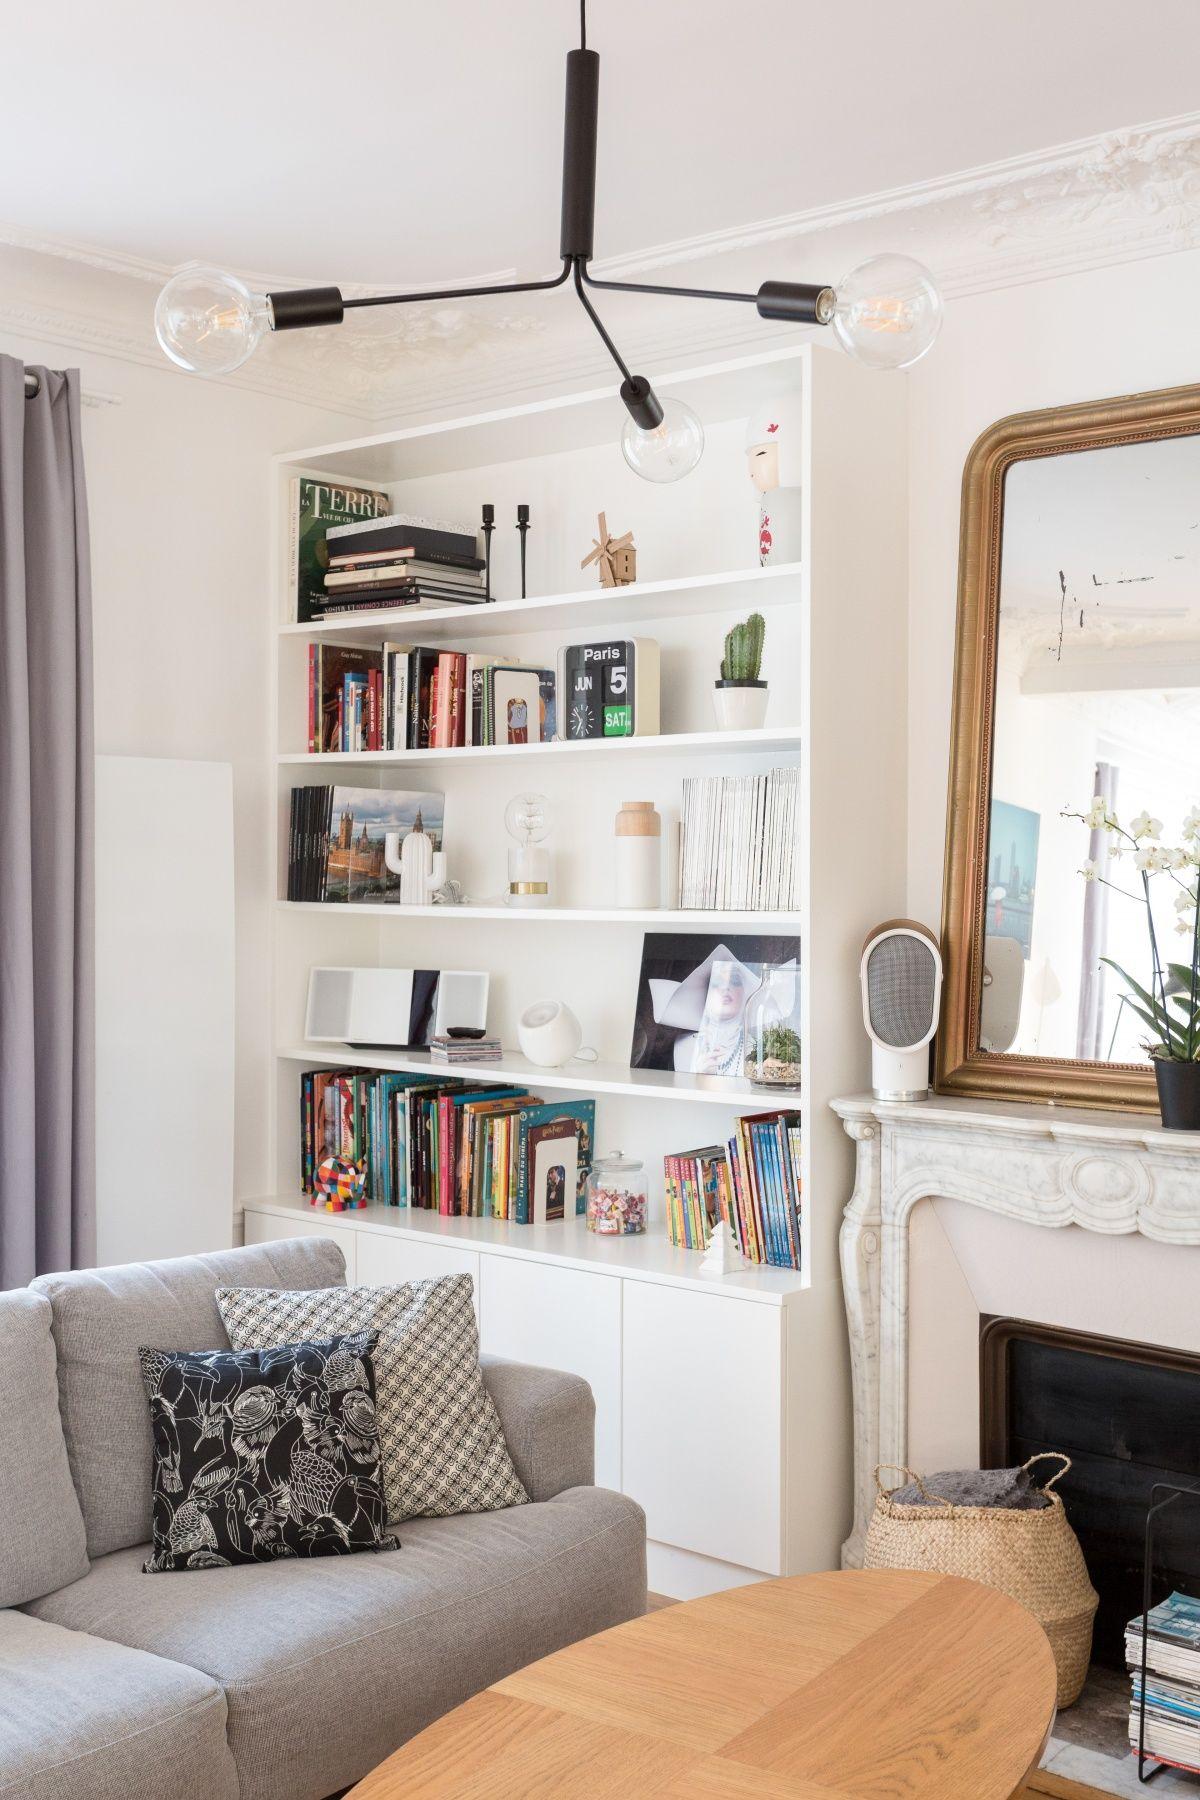 mon concept habitation r novation 2 0 une entreprise. Black Bedroom Furniture Sets. Home Design Ideas